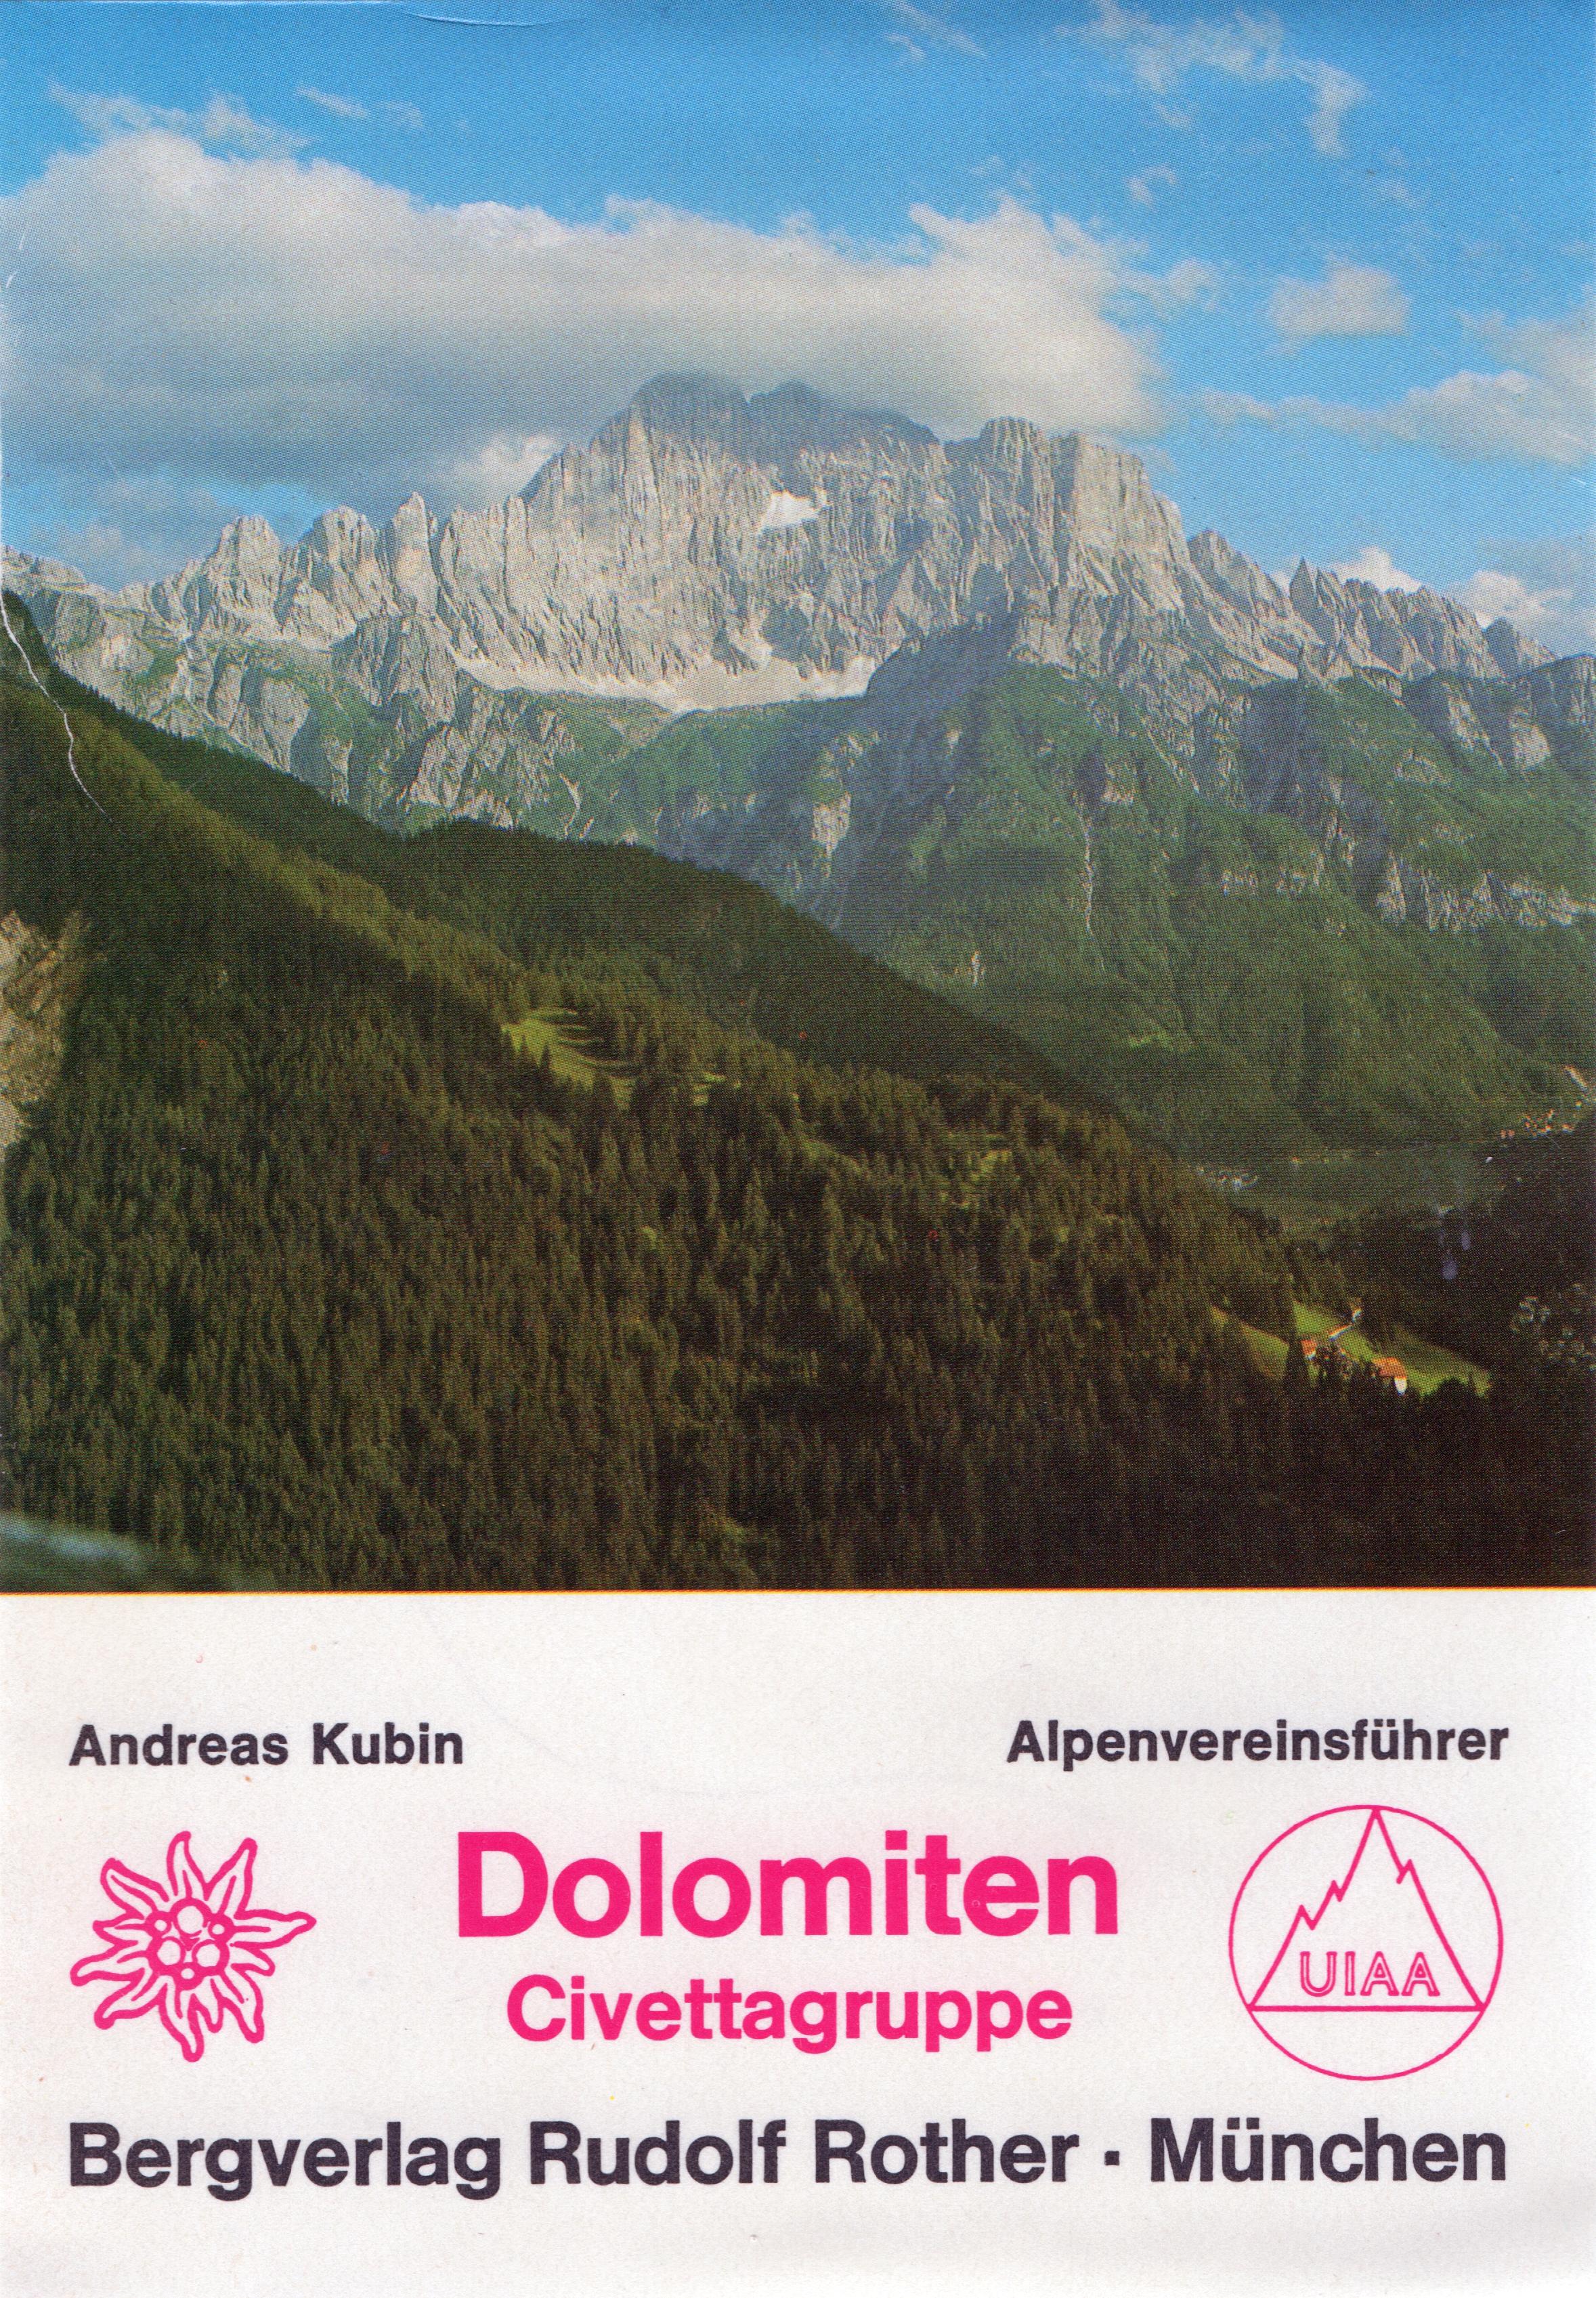 Alpenvereinsführer Civettagruppe - Dolomiten